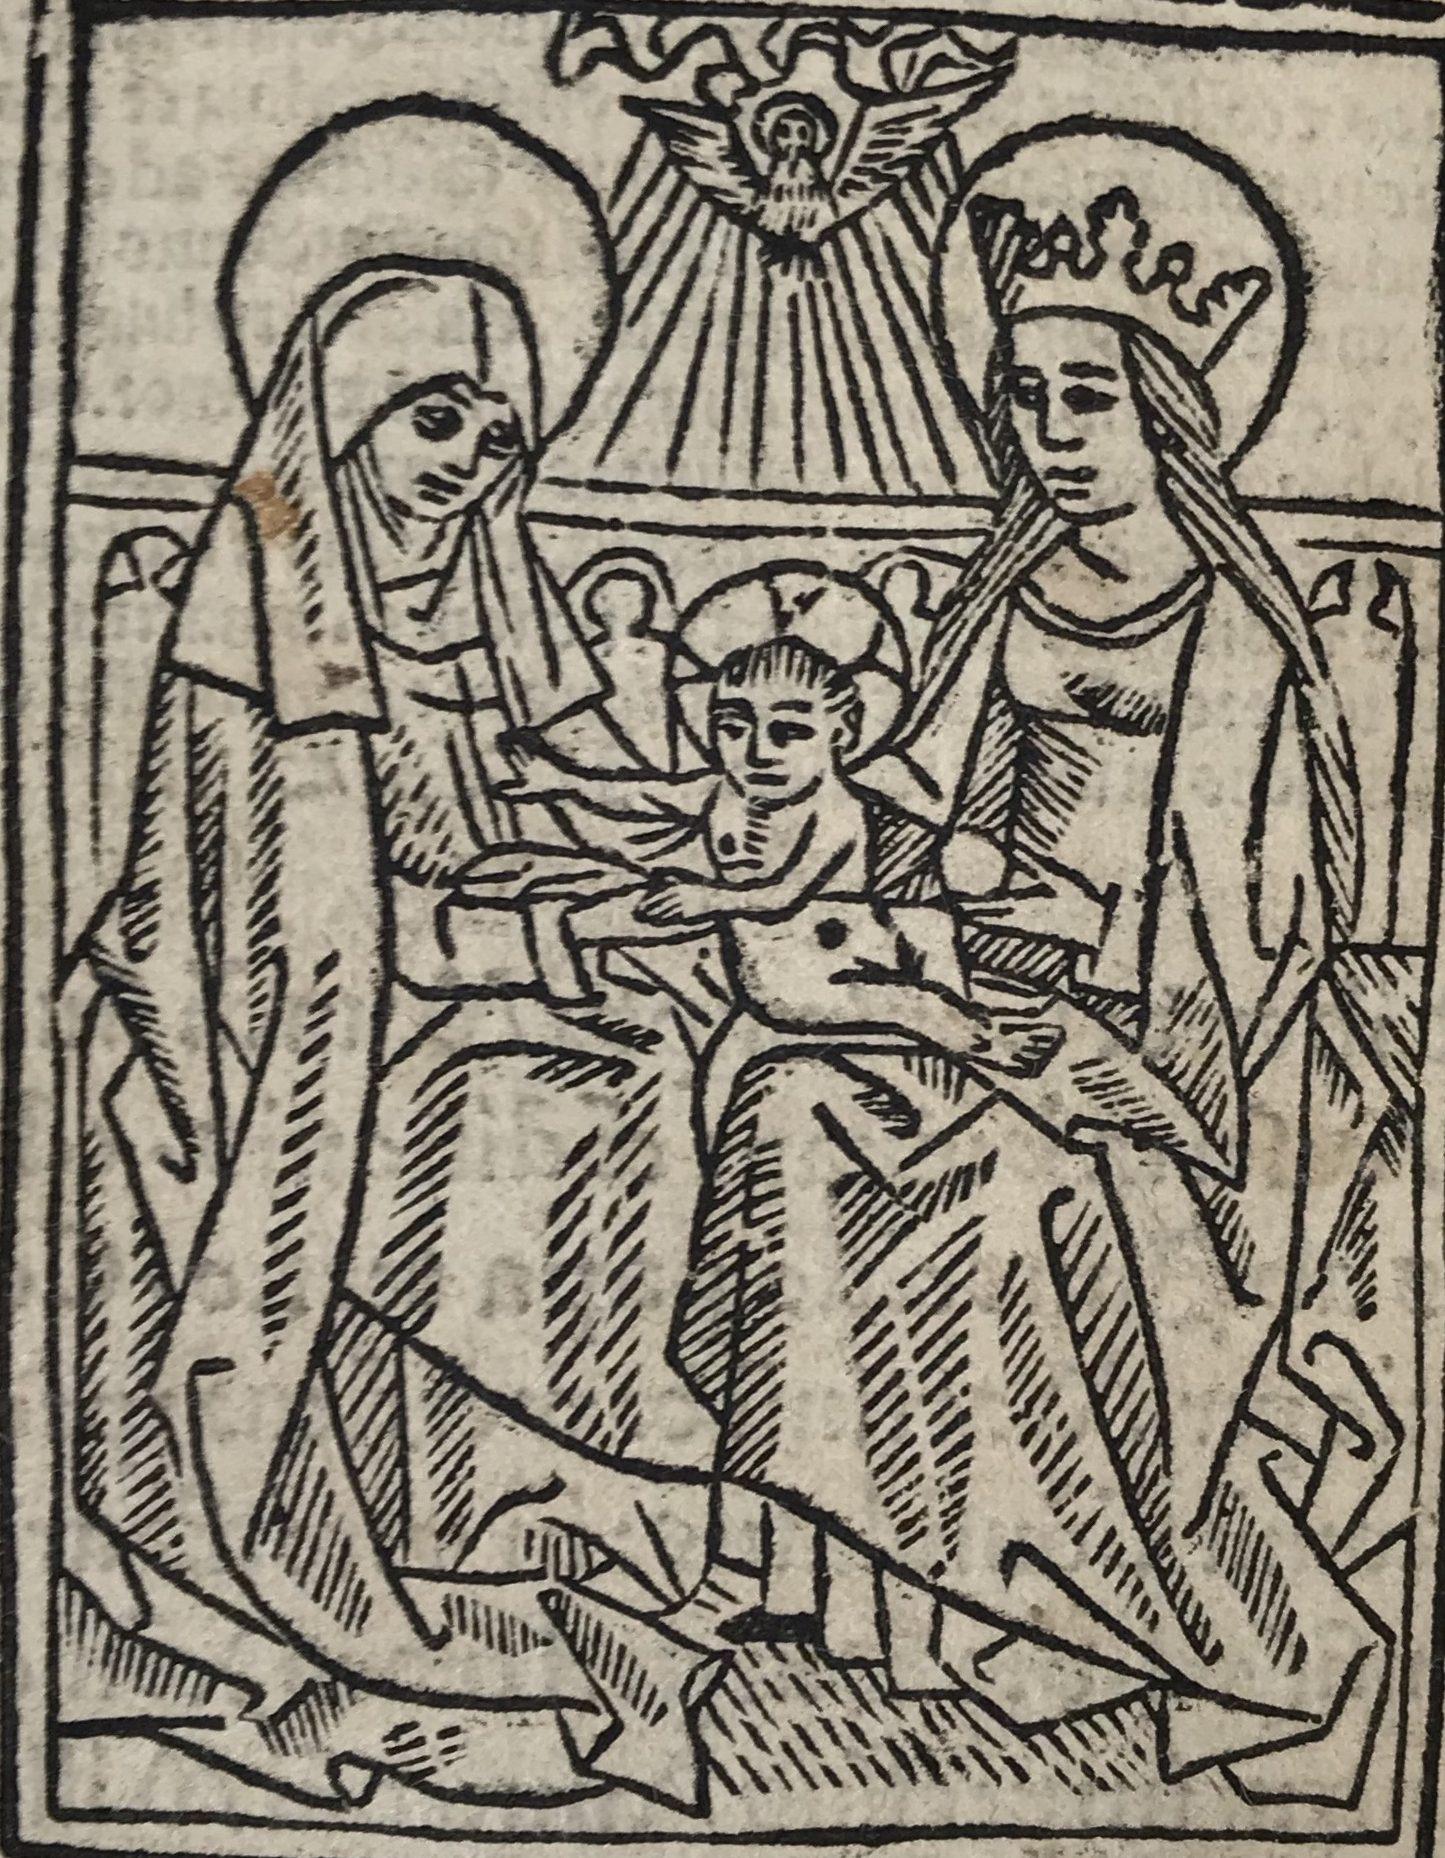 INNOCENT III, Pope